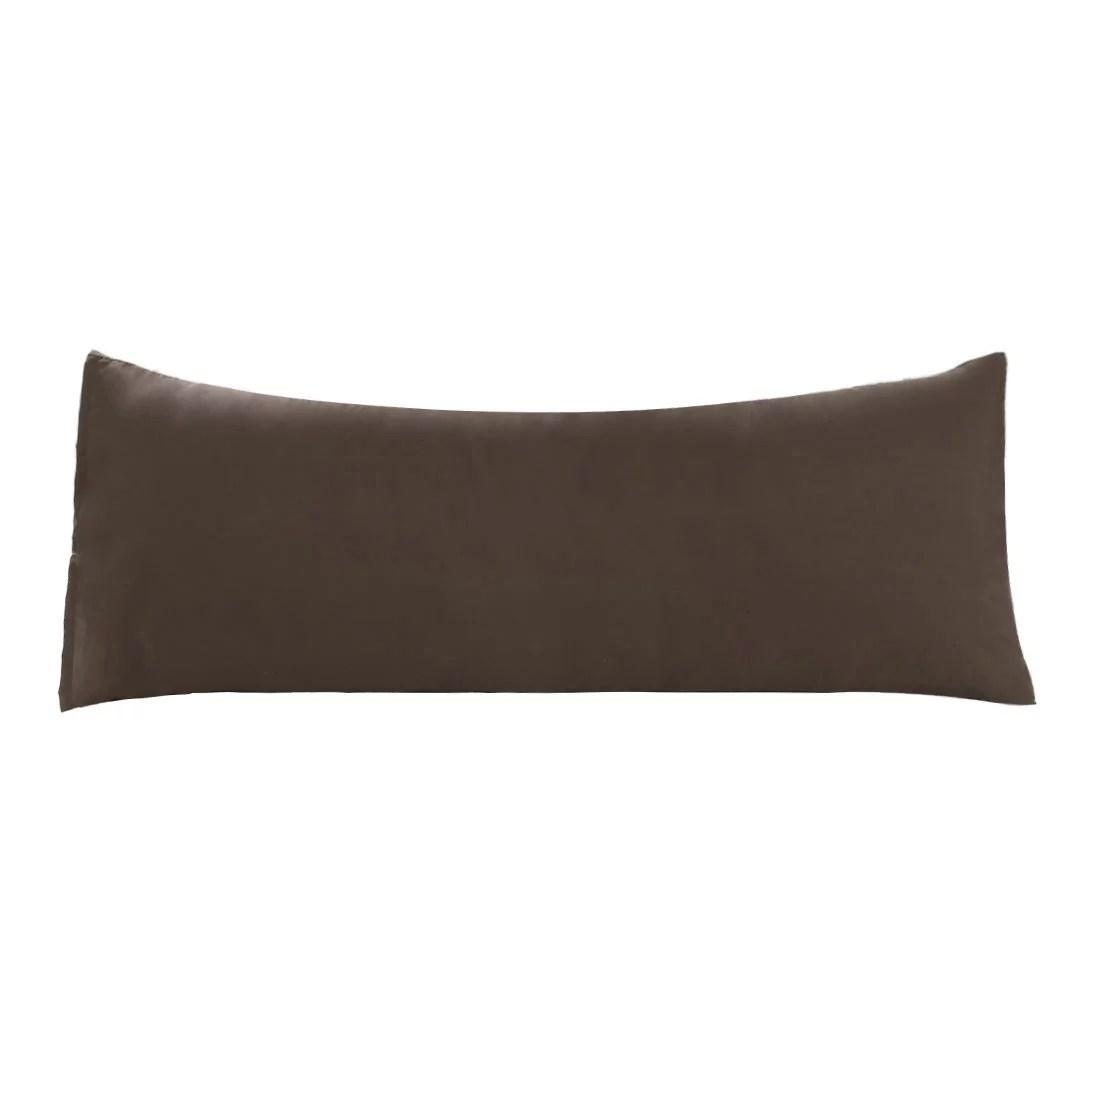 unique bargains microfiber pillowcase long bolster body pillow cover 20 x 48